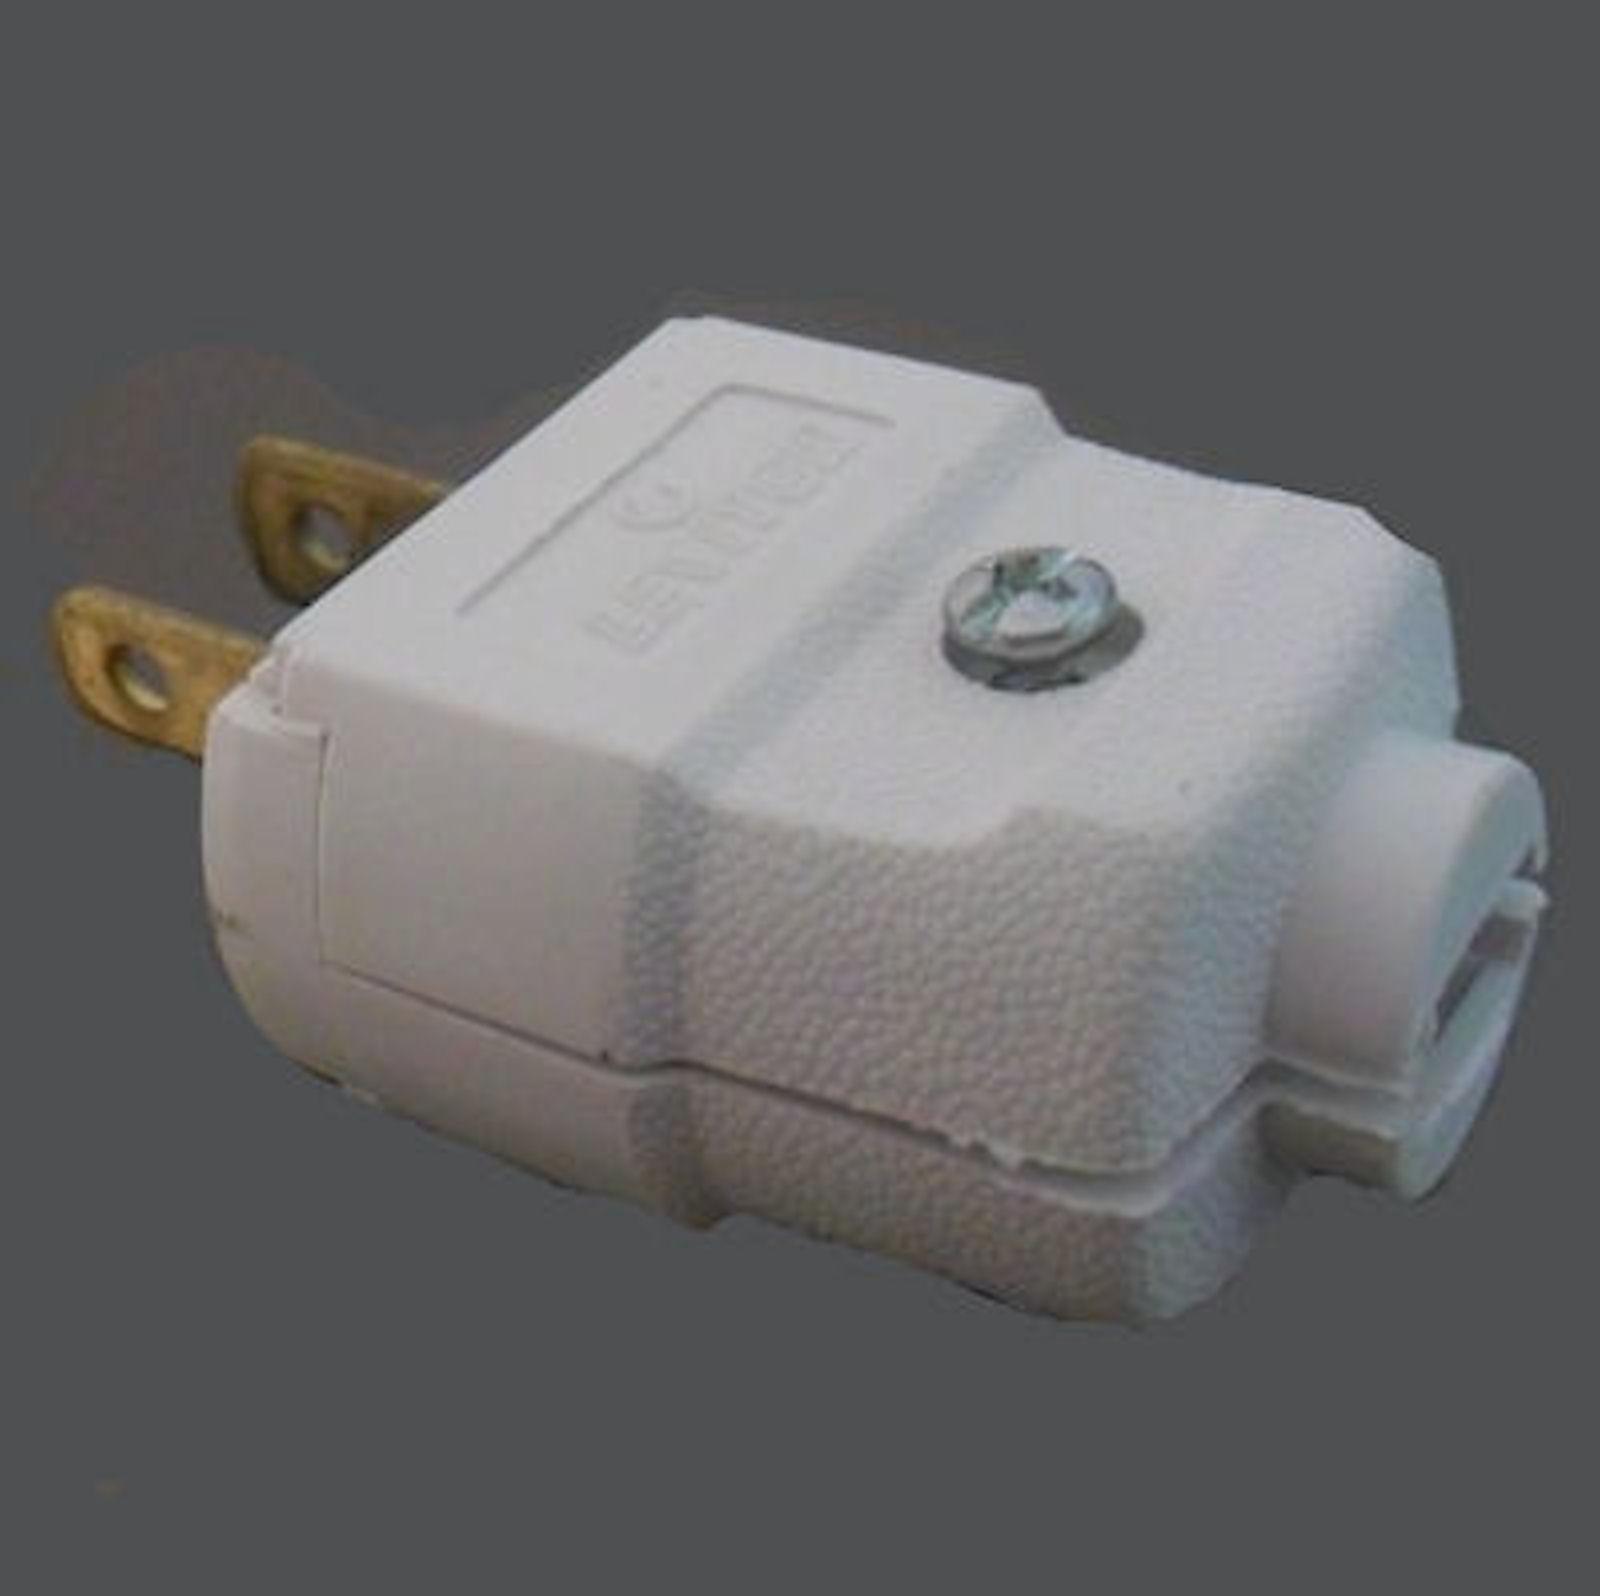 WHITE MALE 2-WIRE 2-POLE PLUG, Texas Lamp Parts